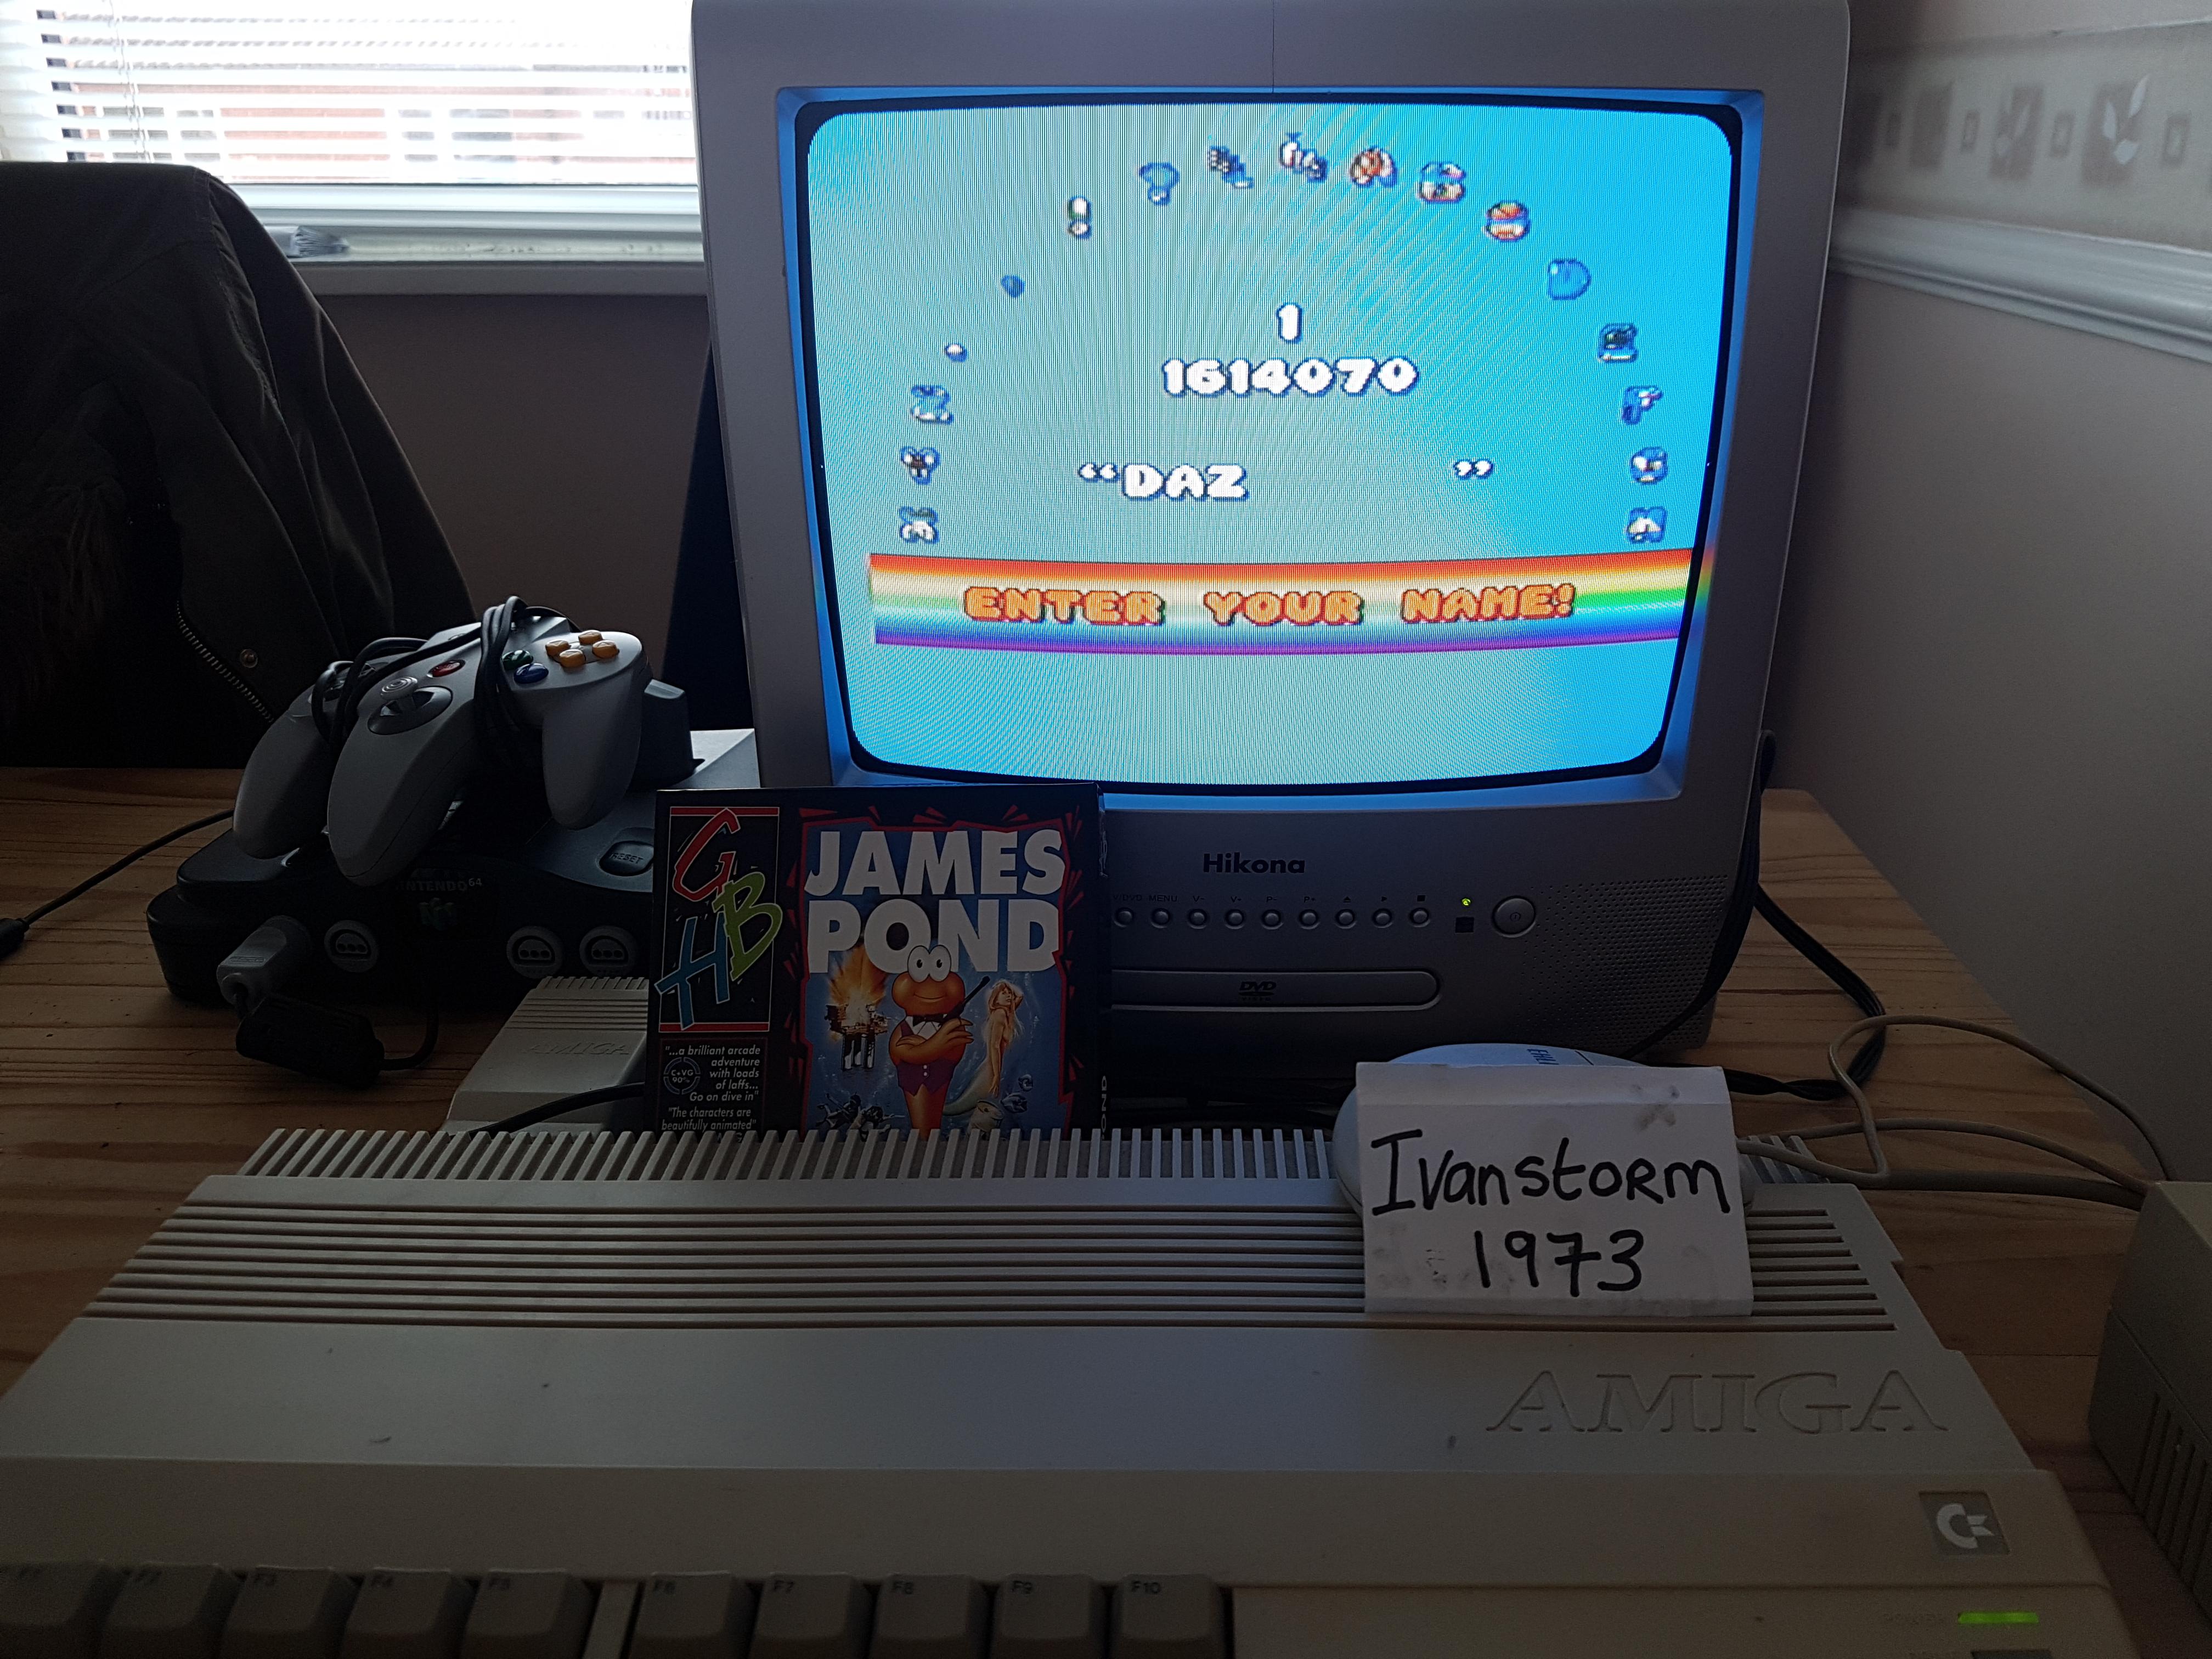 Ivanstorm1973: James Pond: Underwater Agent (Amiga) 1,614,070 points on 2018-02-20 14:15:17